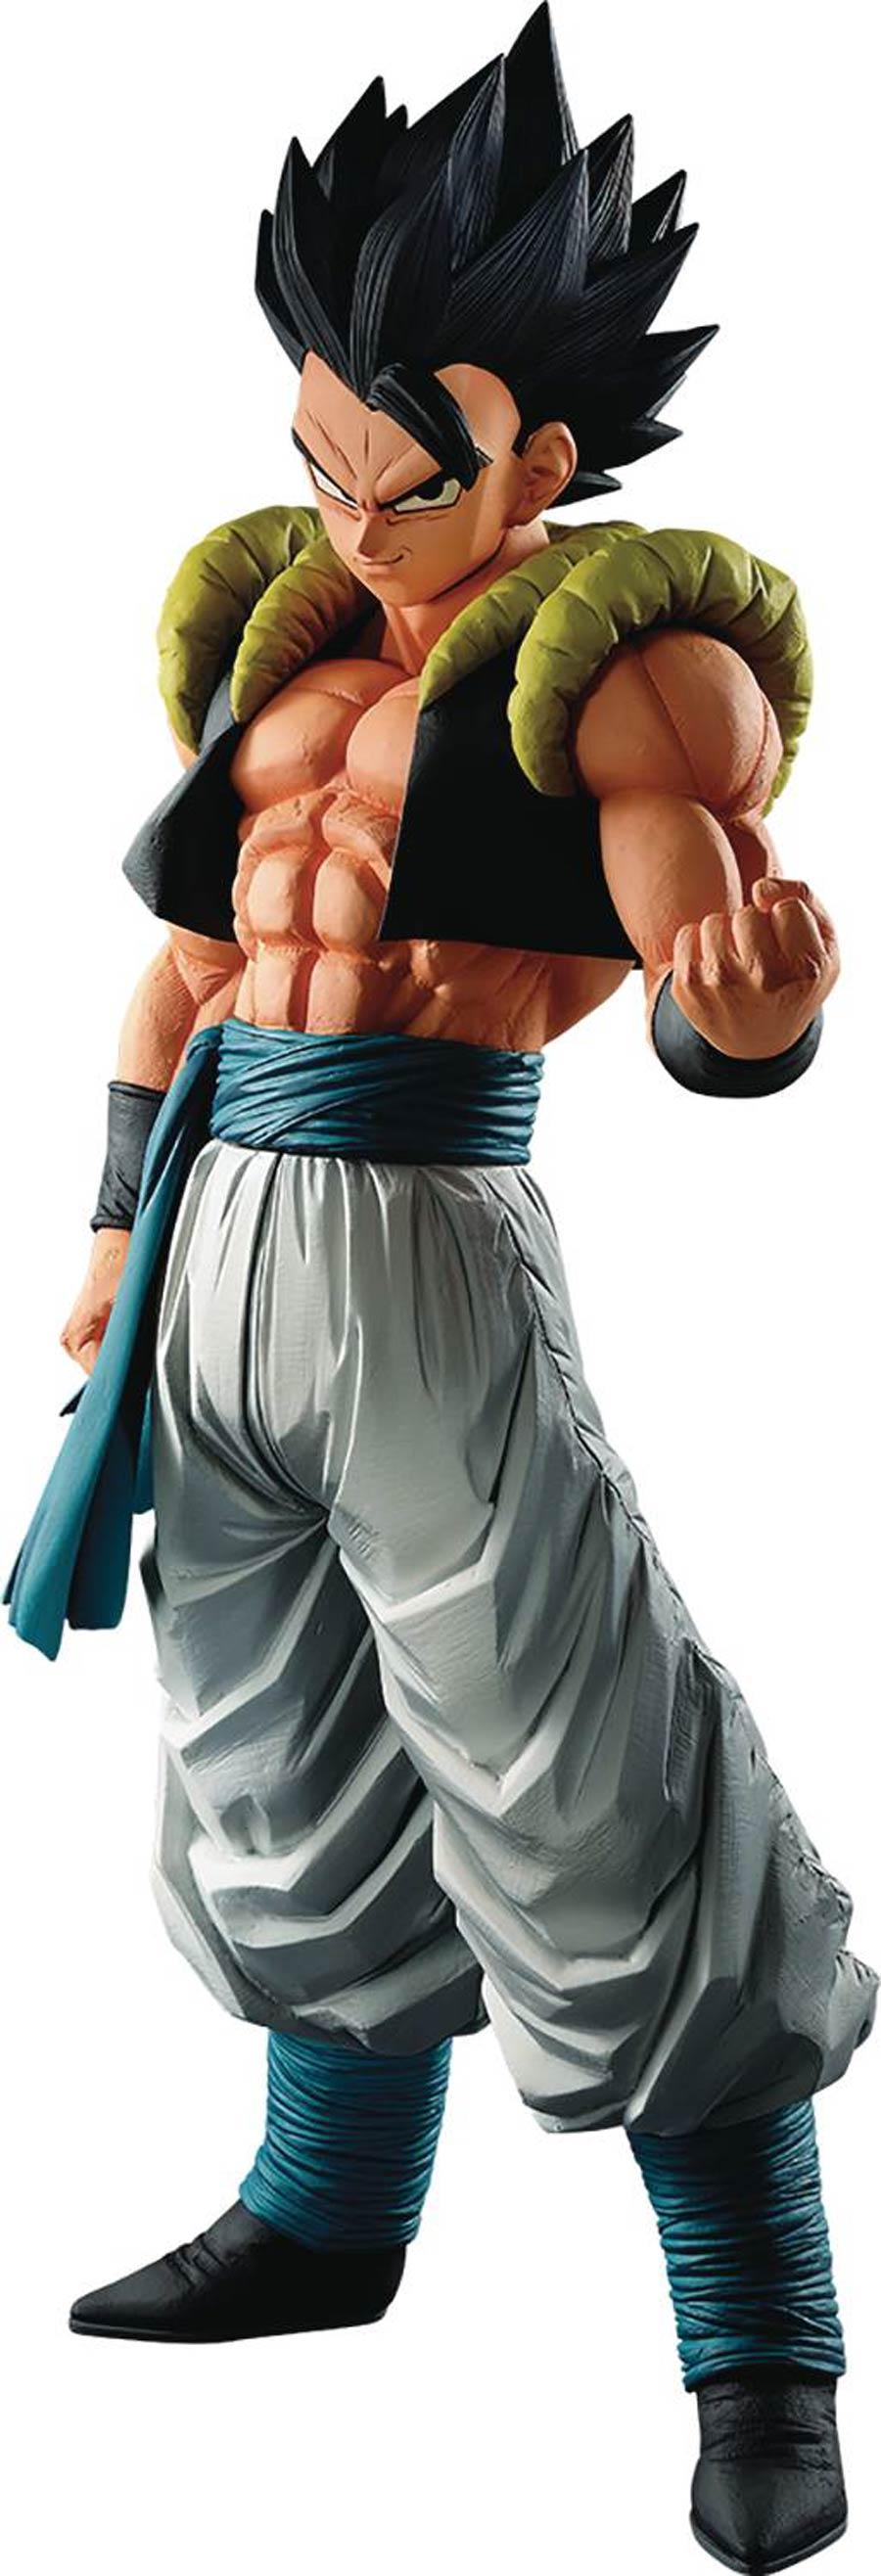 Dragon Ball Super Ichiban - Gogeta (Extreme Saiyan) Figure